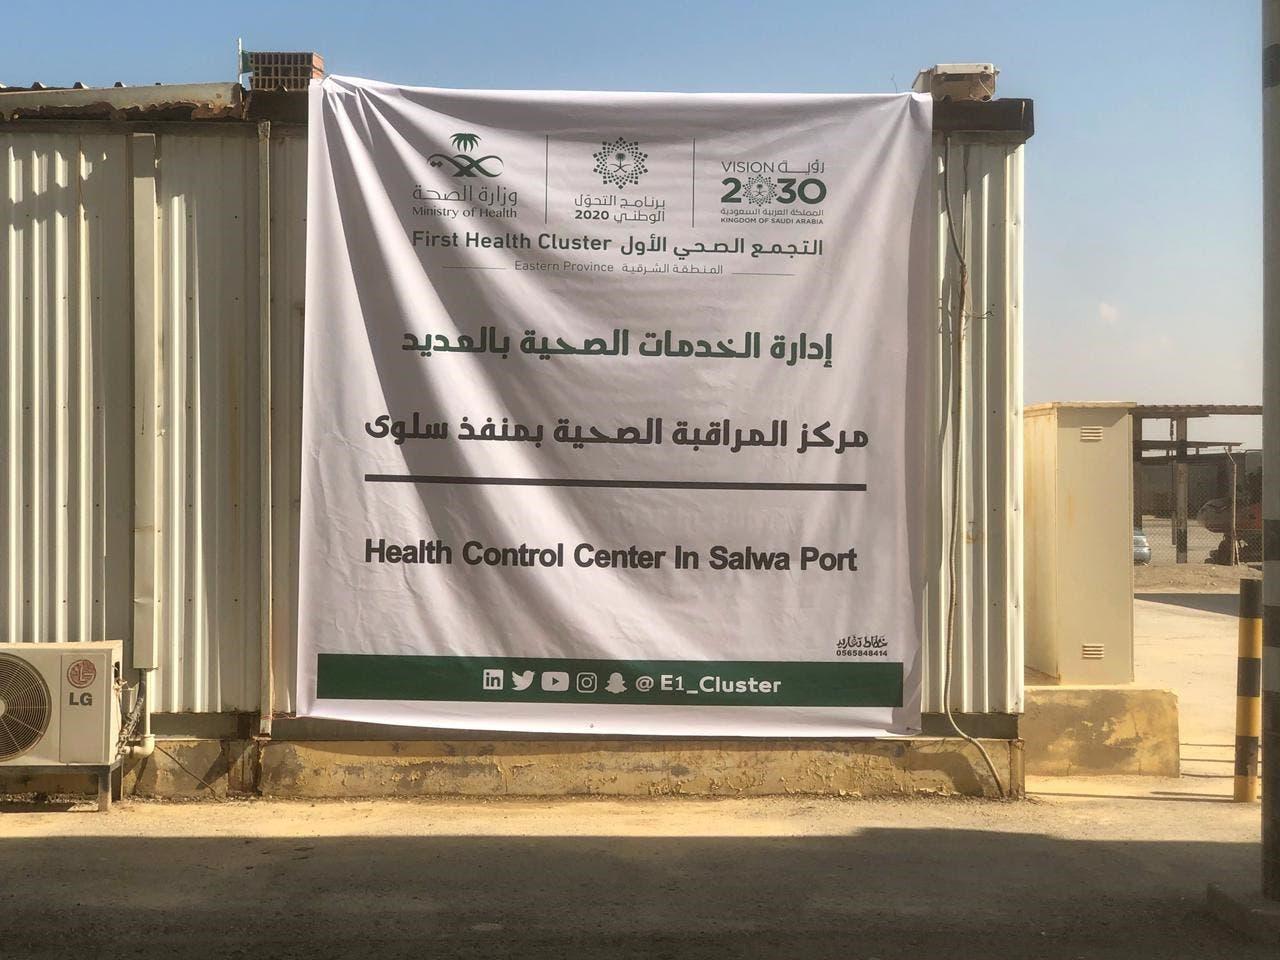 Al Arabiya exclusive photos shows health center set up at the Salwa border crossing. (Al Arabiya)